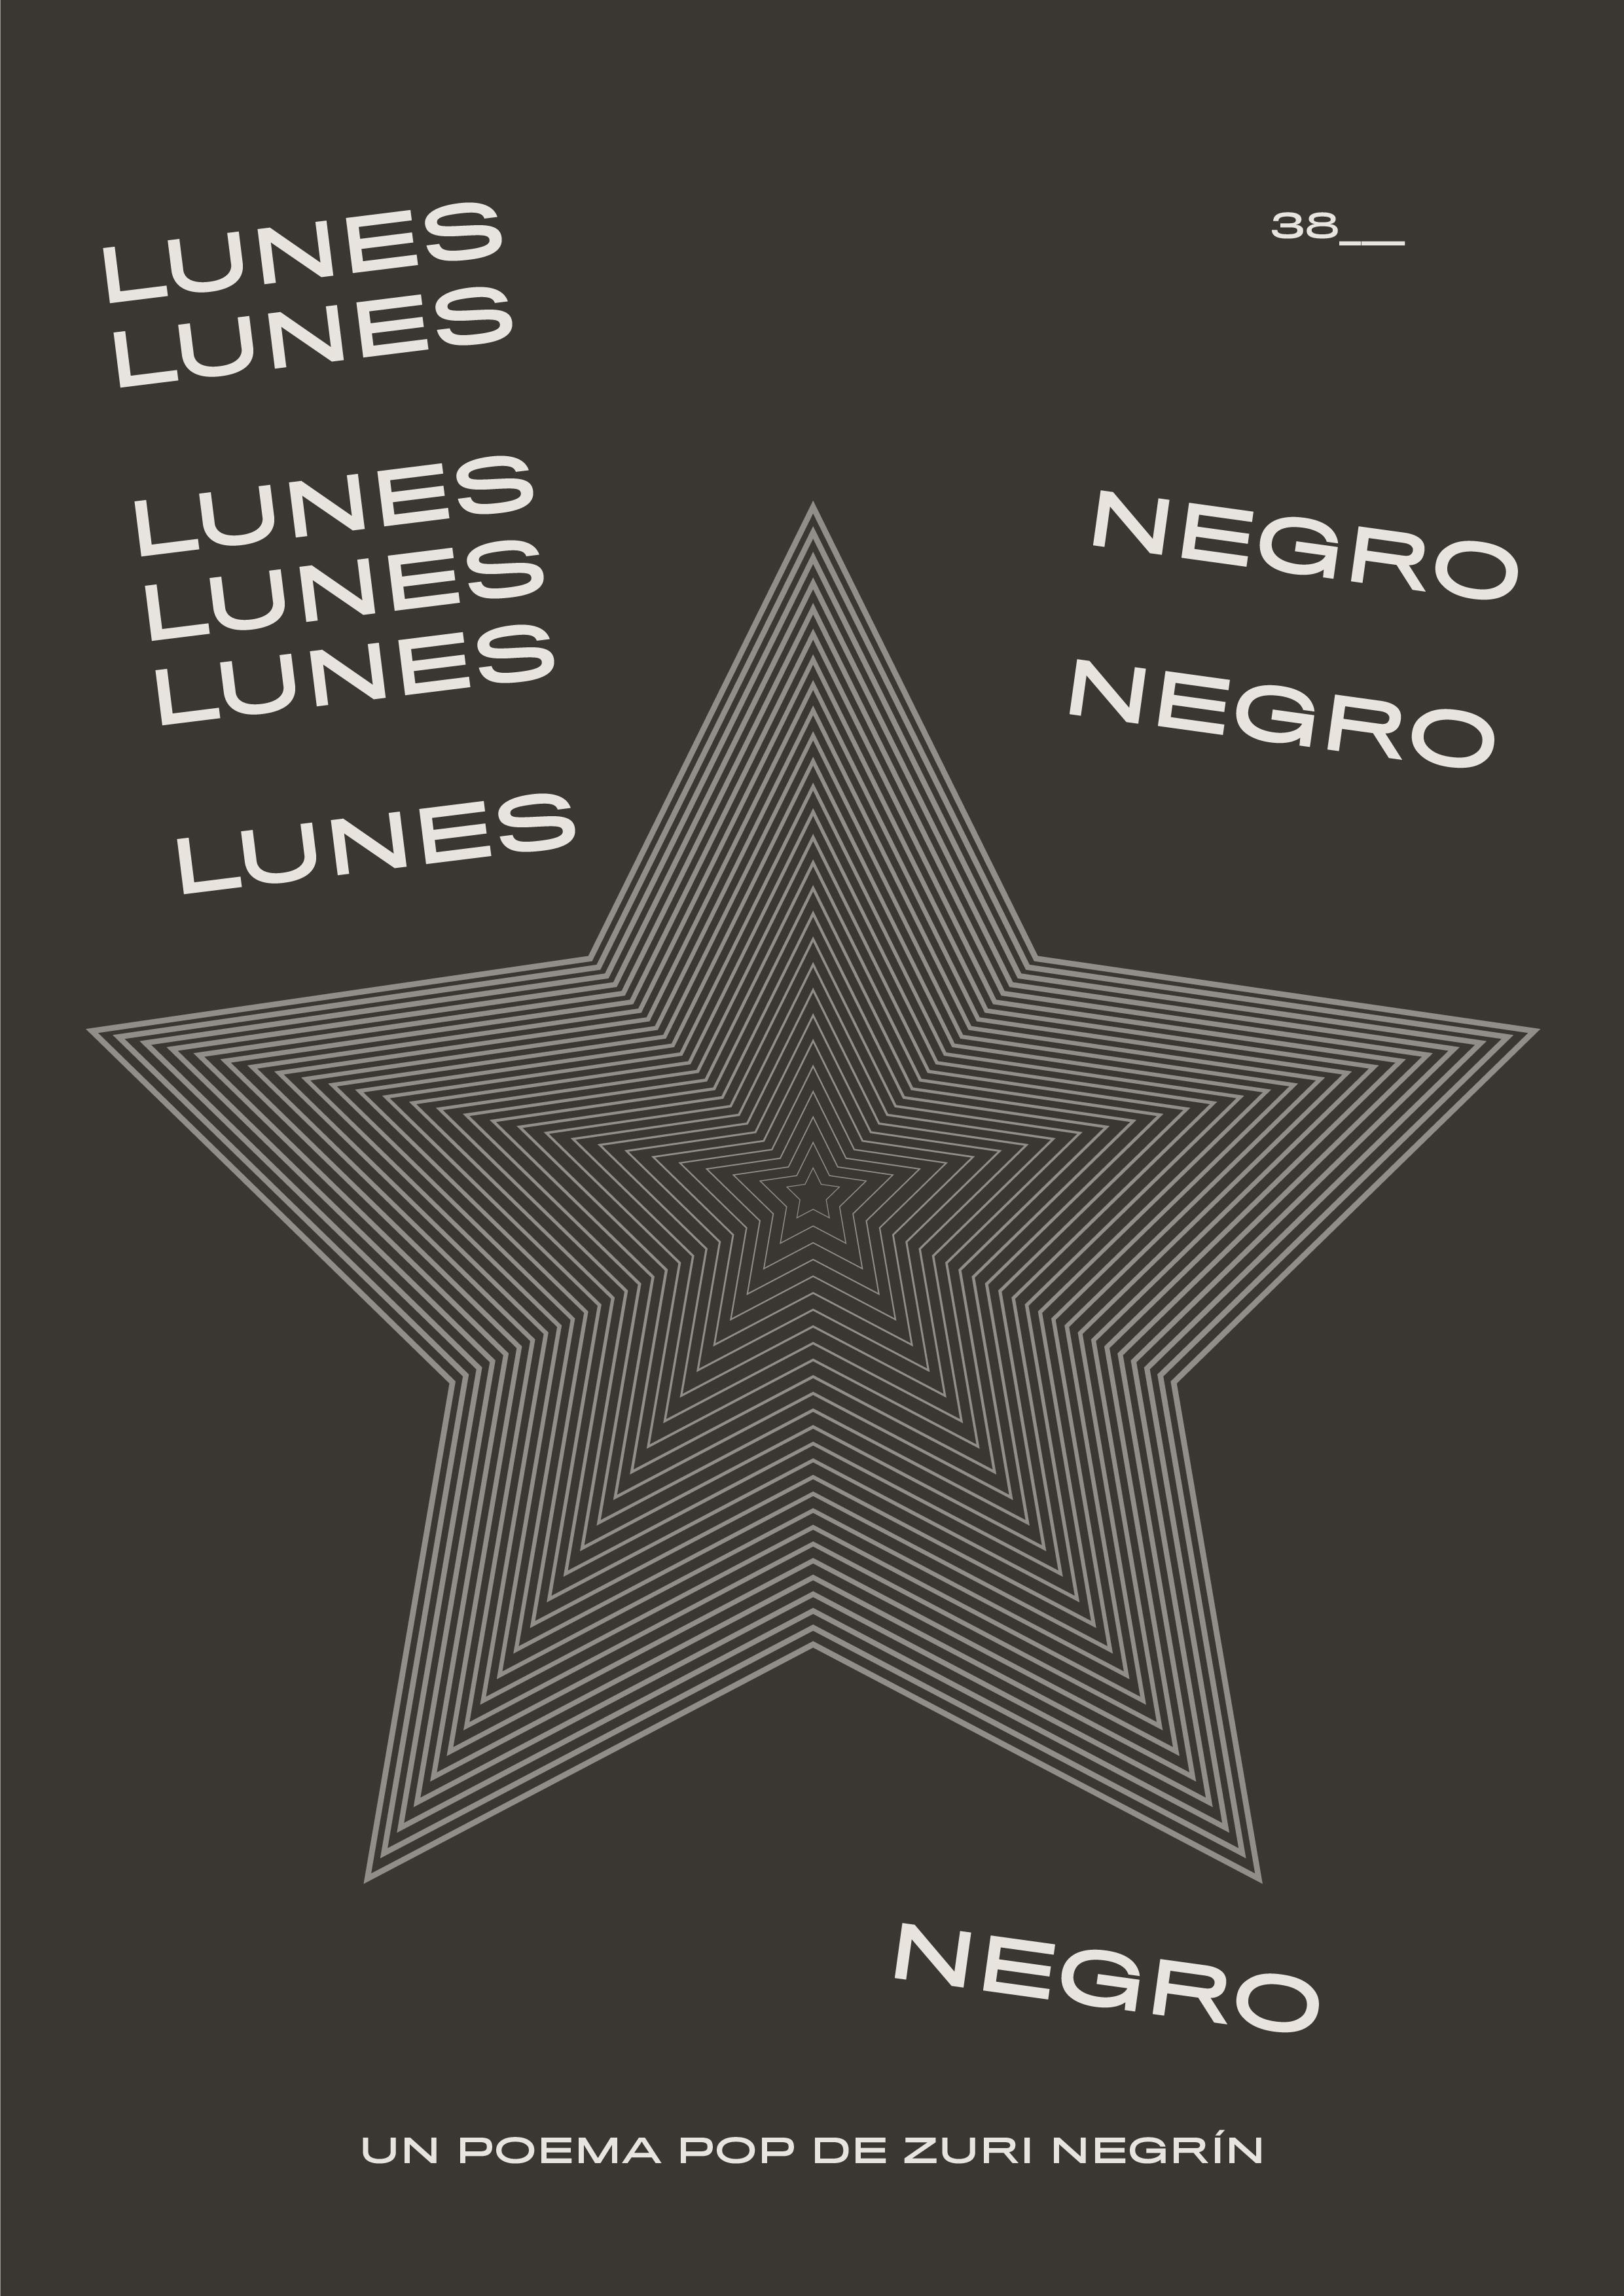 POP_38 Lunes negro